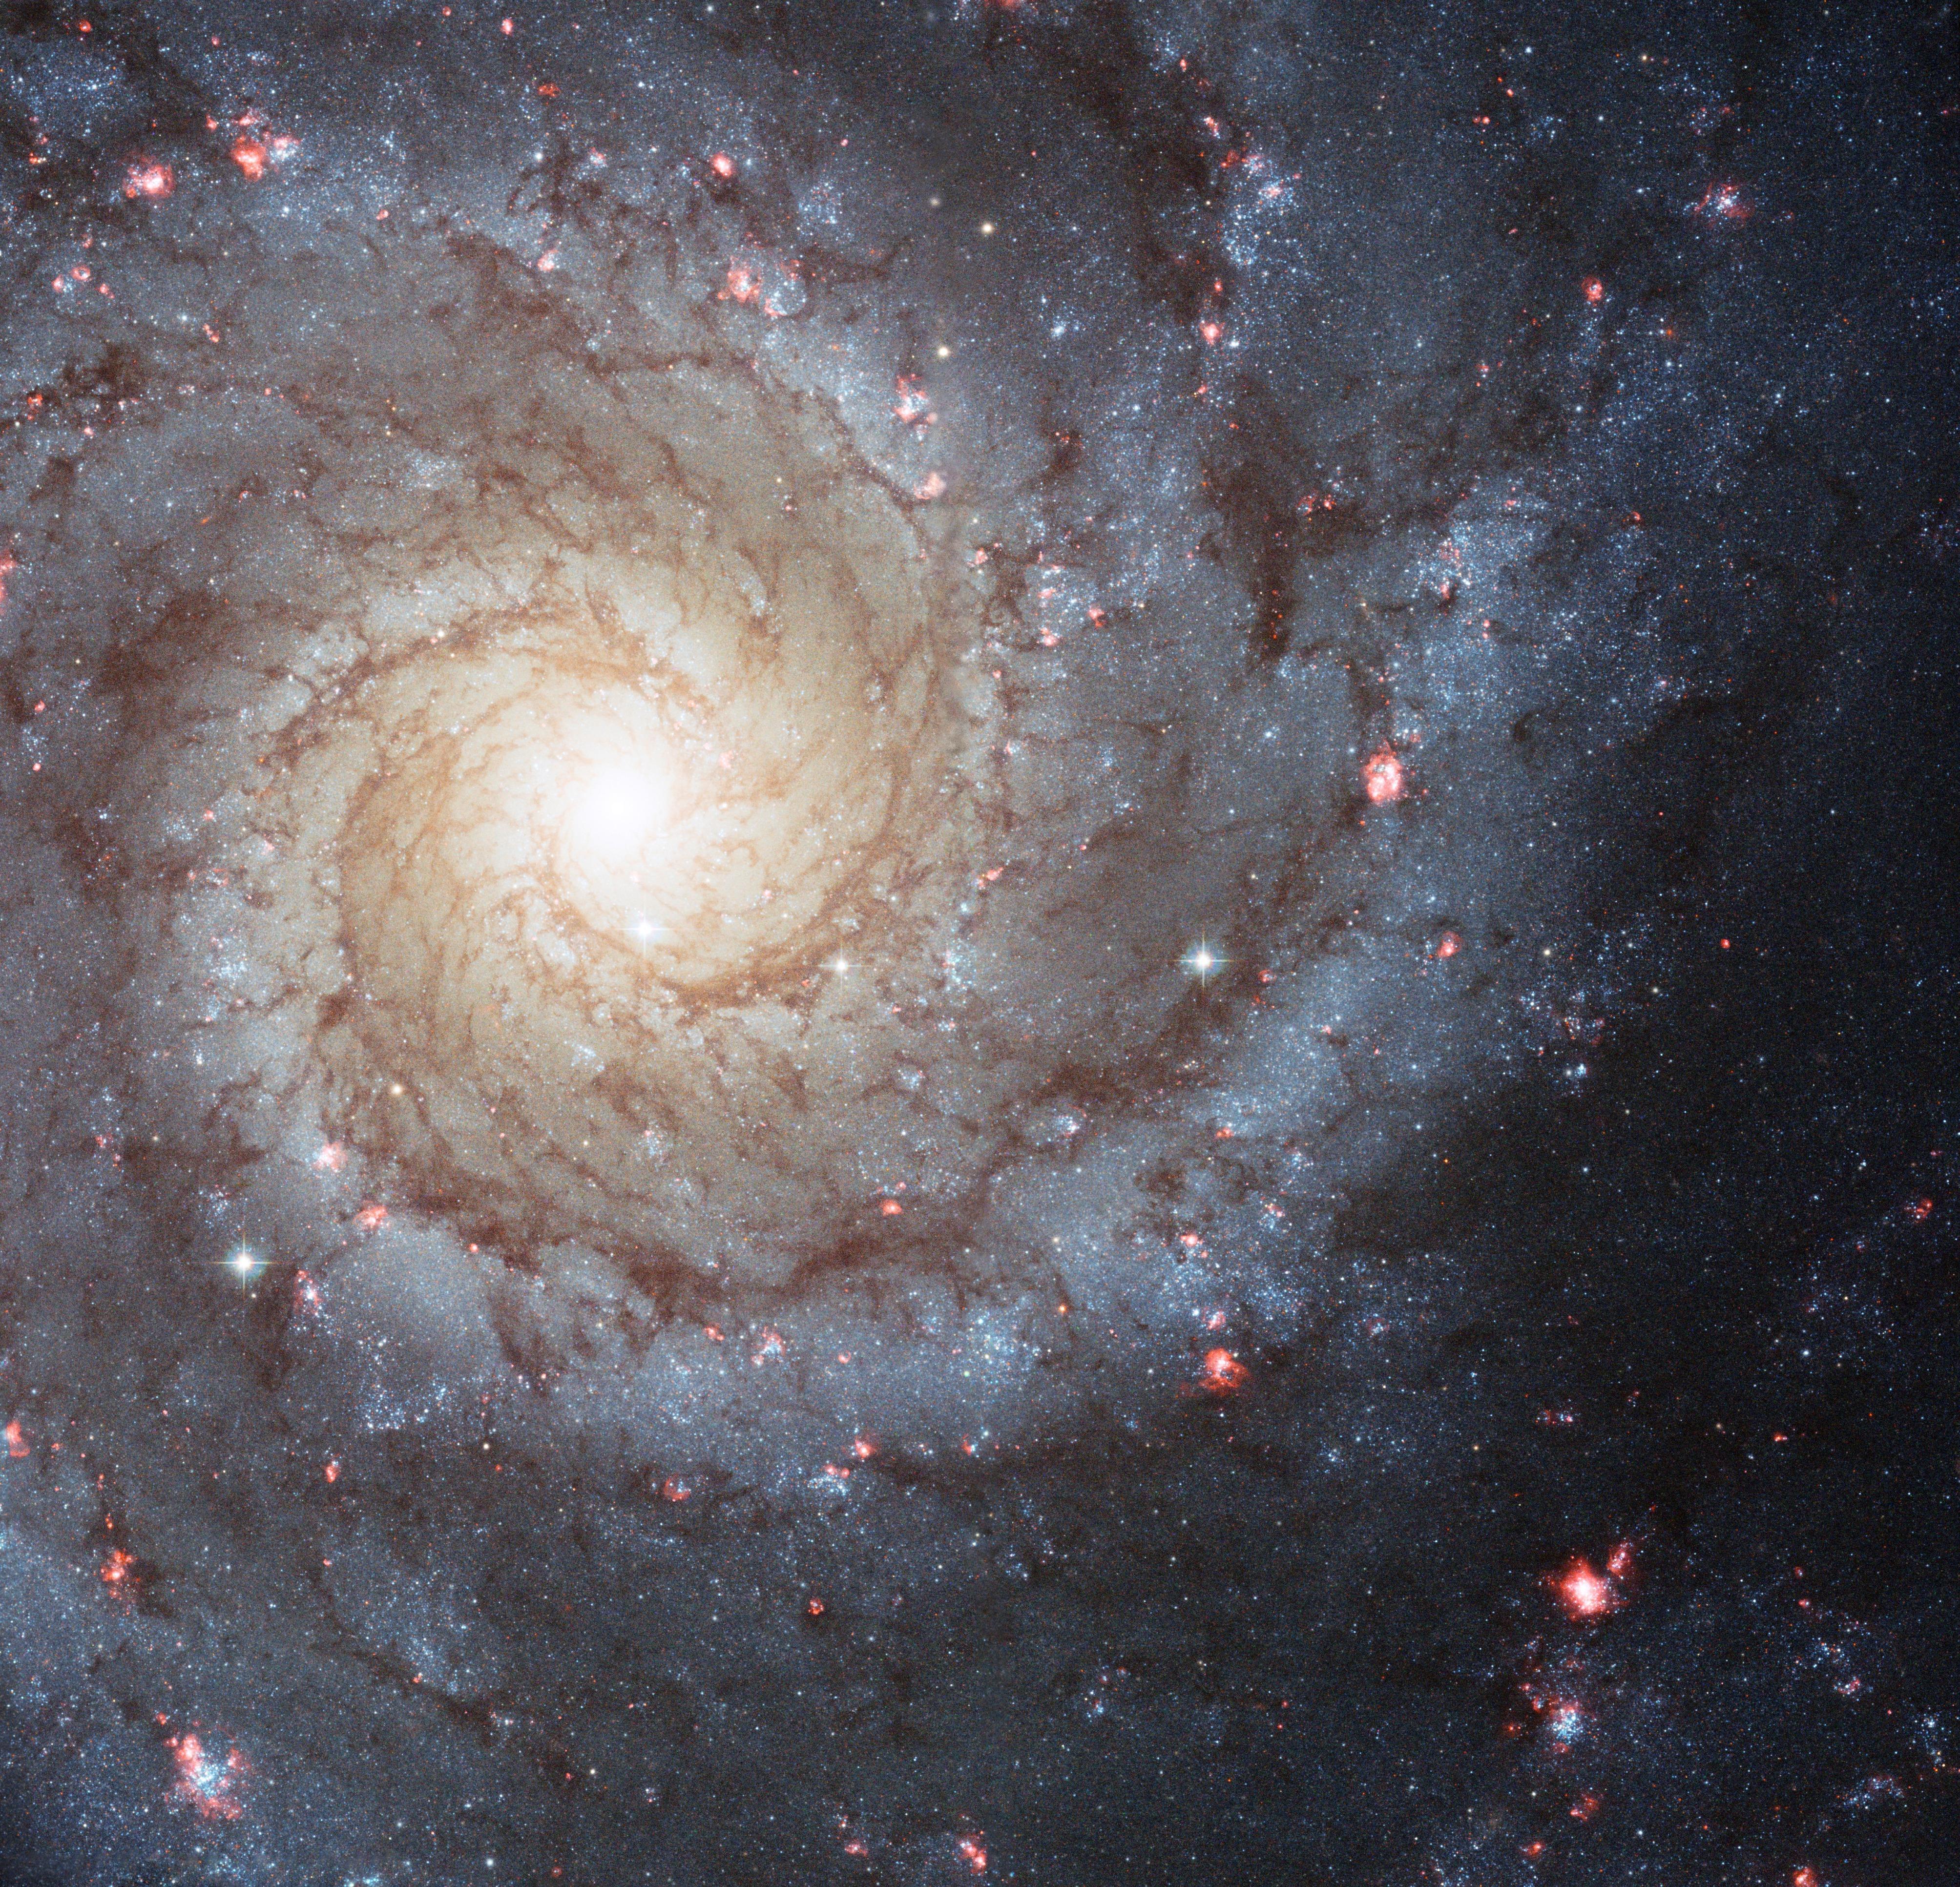 milky way hubble telescope gallery - photo #27